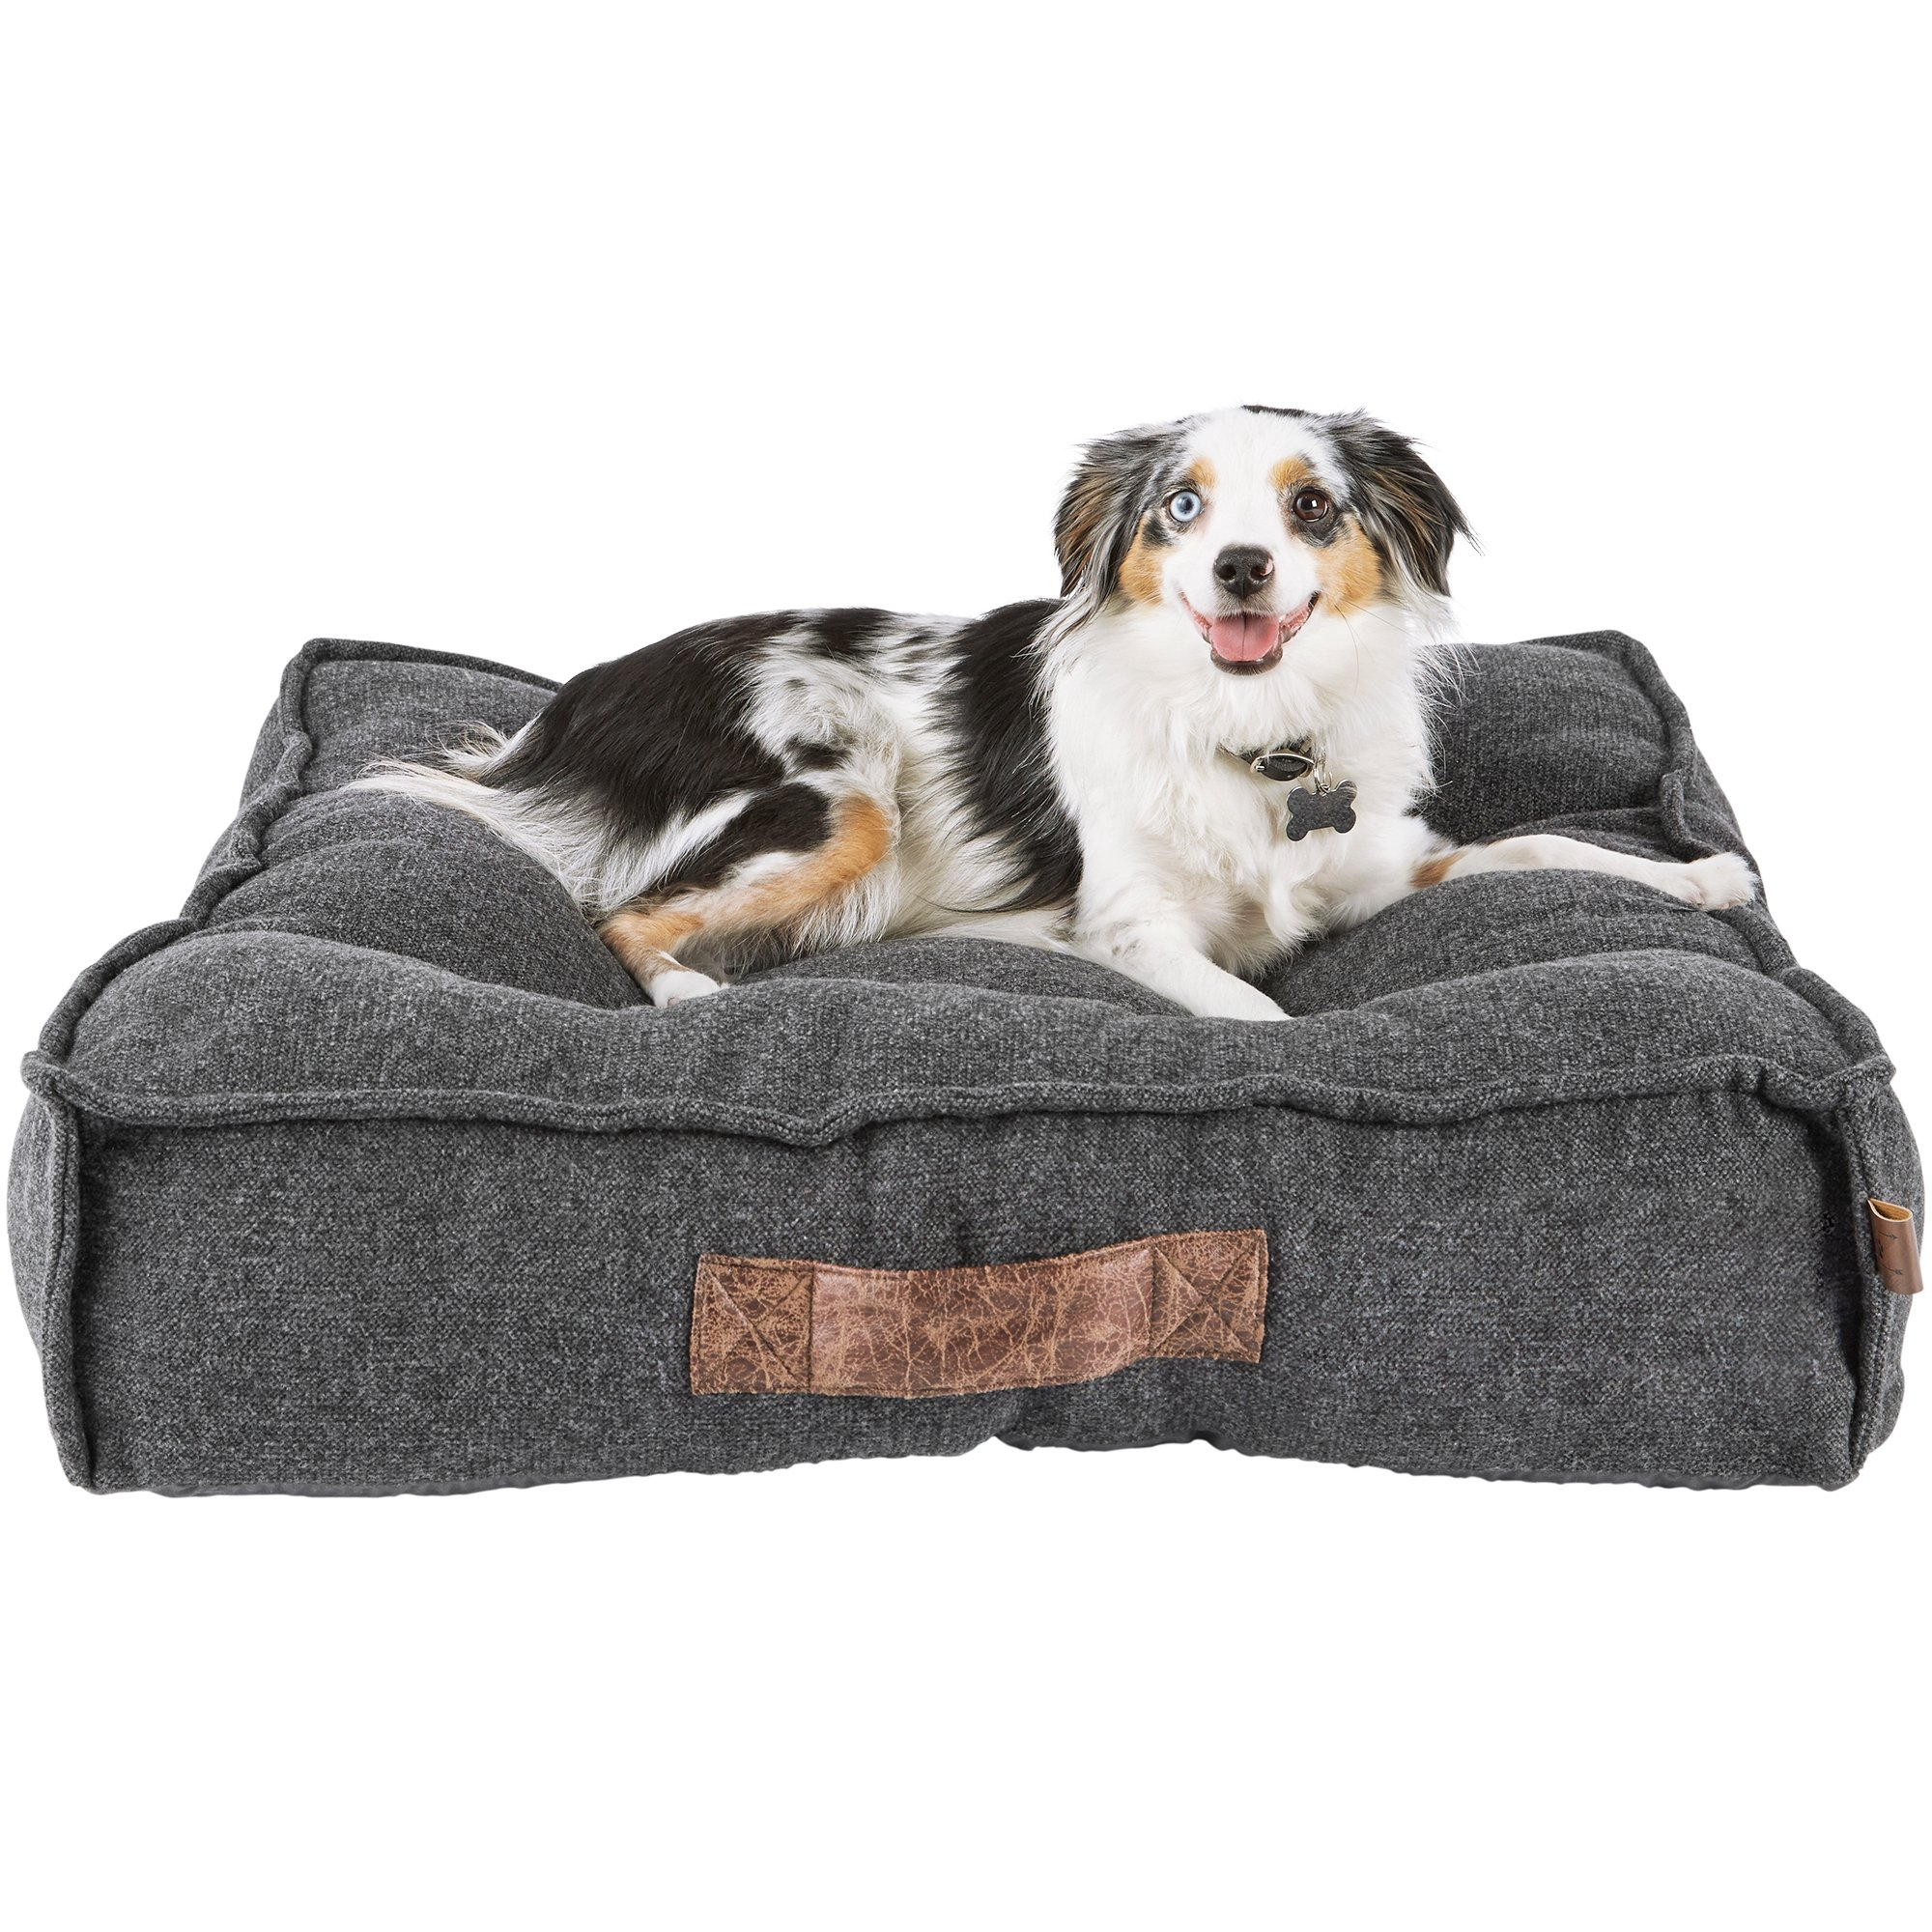 sofa covers petsmart chaise recliner bass pro shop dog bed goldenacresdogs